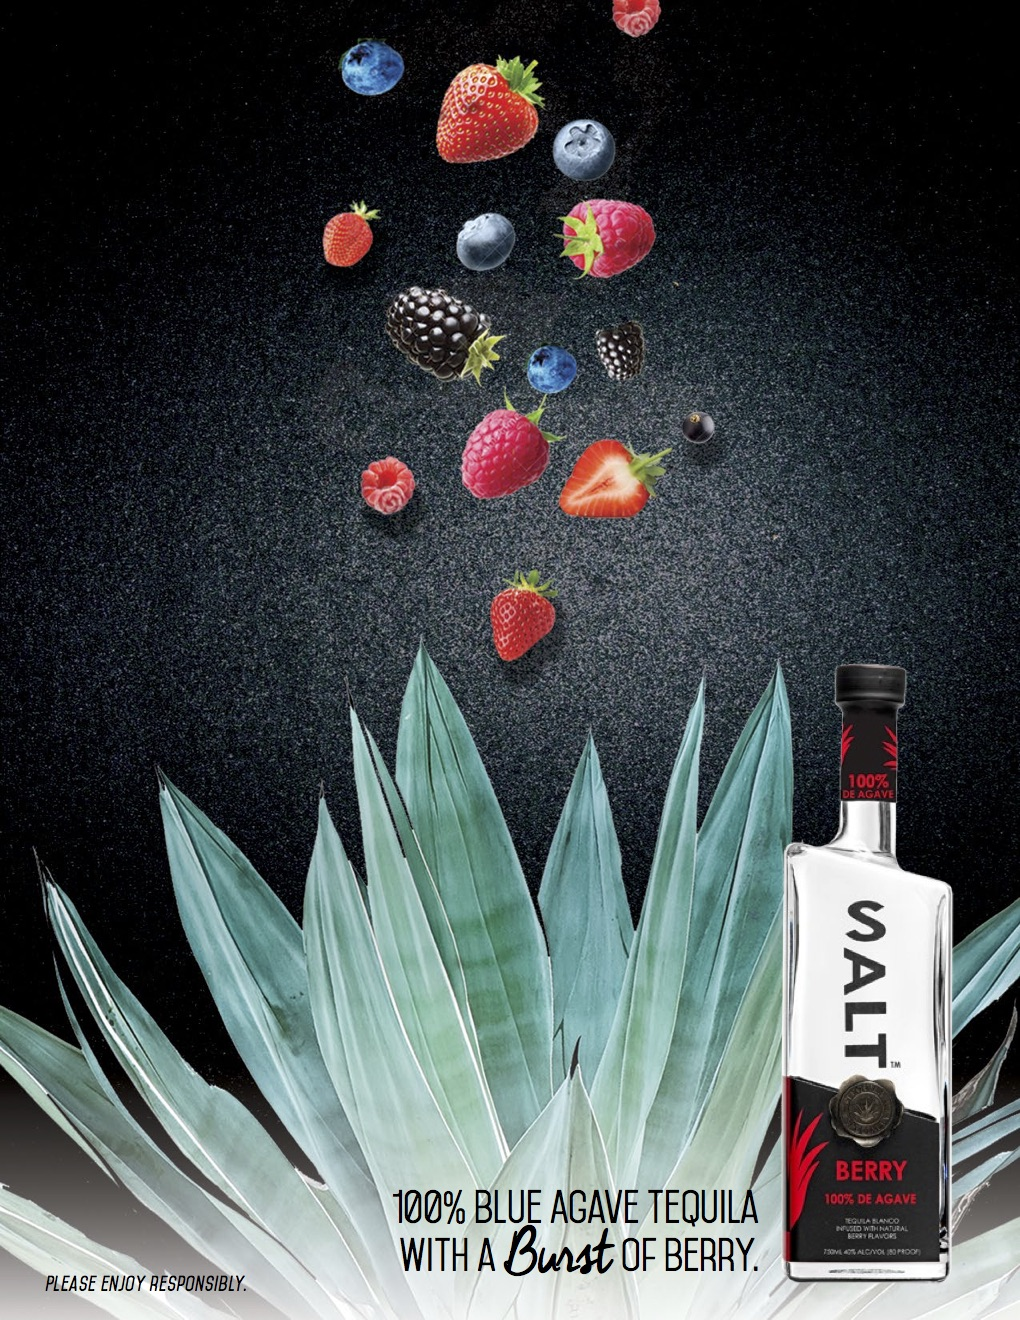 SALT_Tequila_Agave_R3.jpg